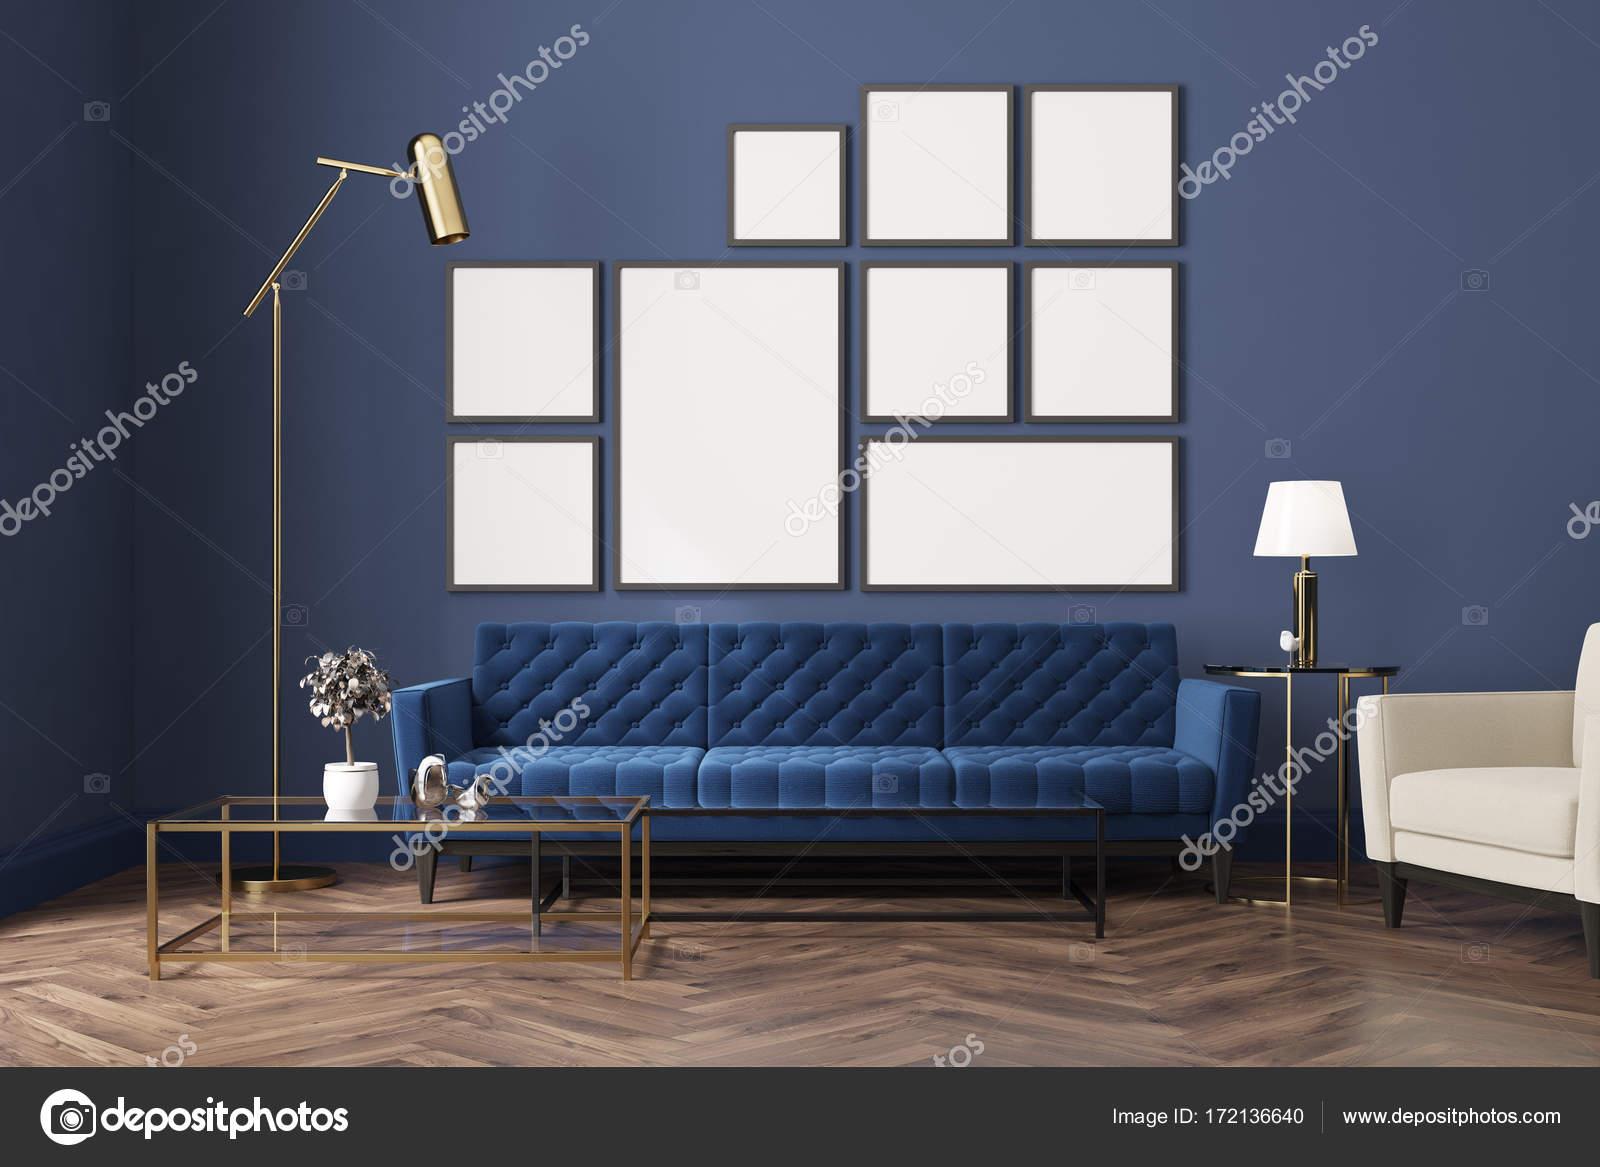 Sof Da Sala Azul Azul Galeria De Cartaz Stock Photo  -> Parede Galeria Sala